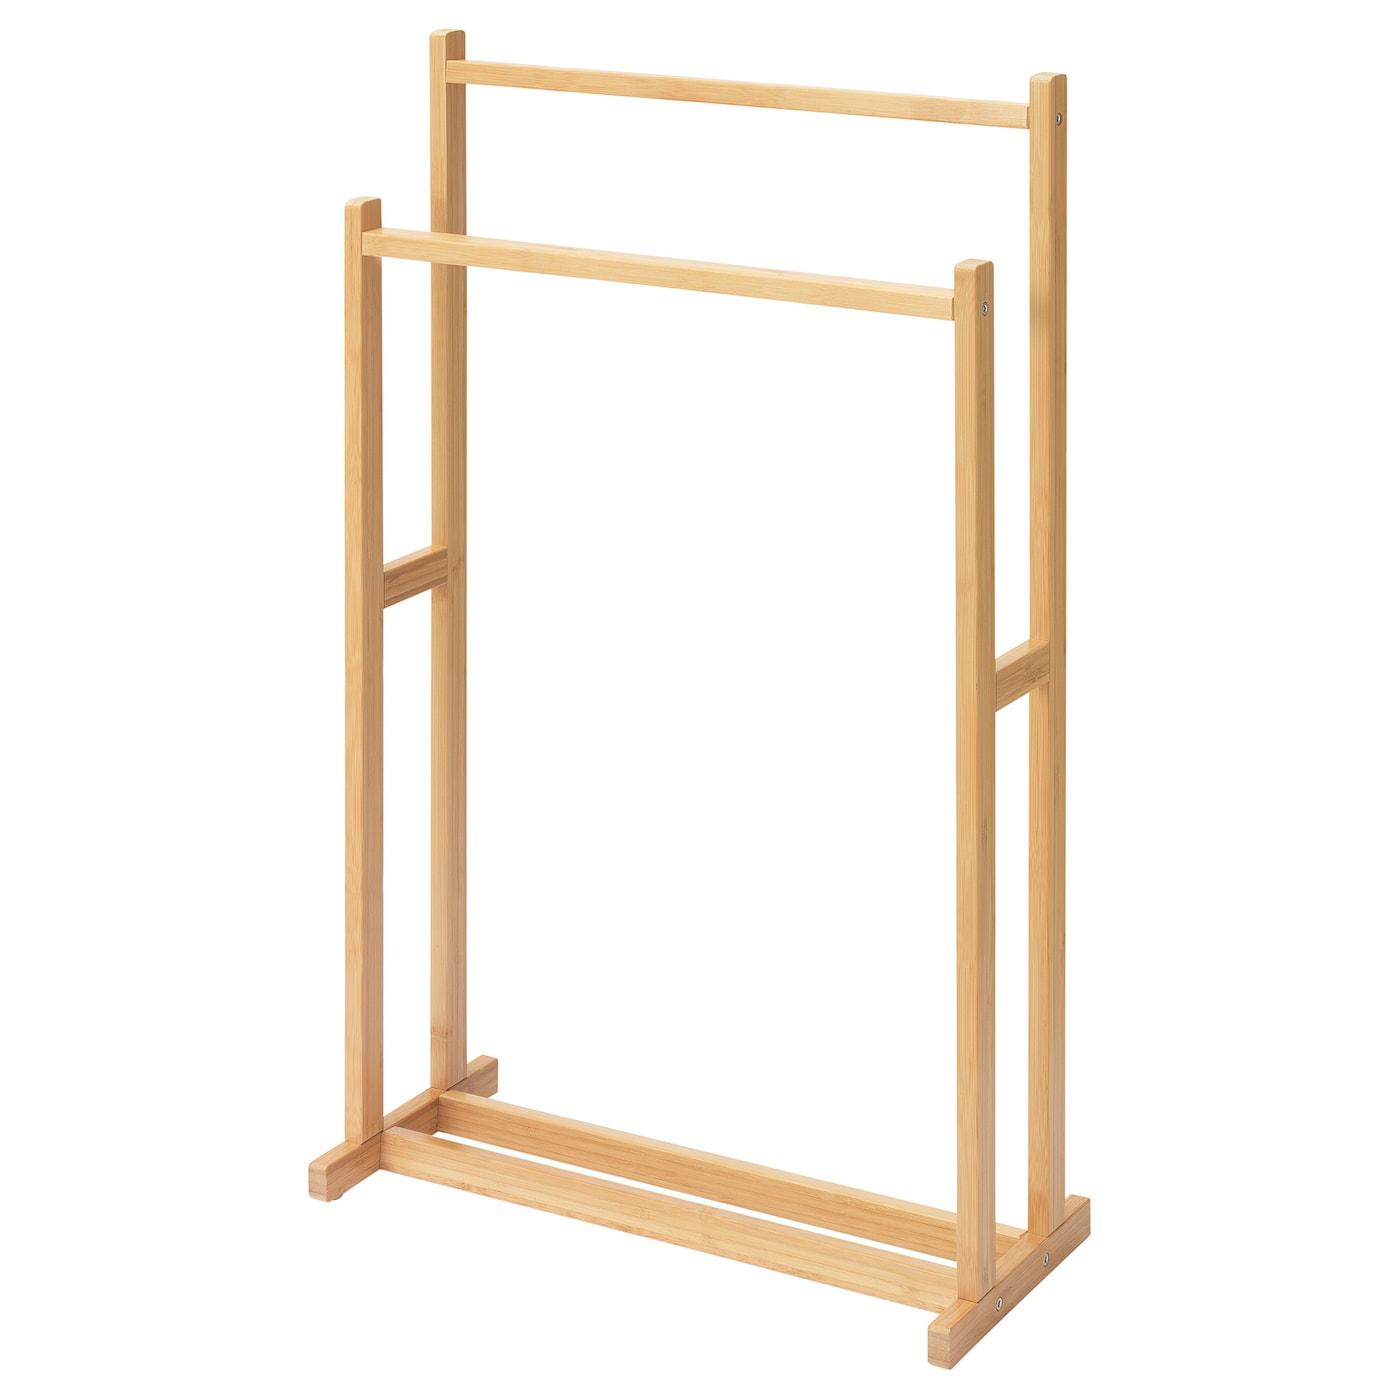 RÅGRUND Toallero 2 brazos bambú